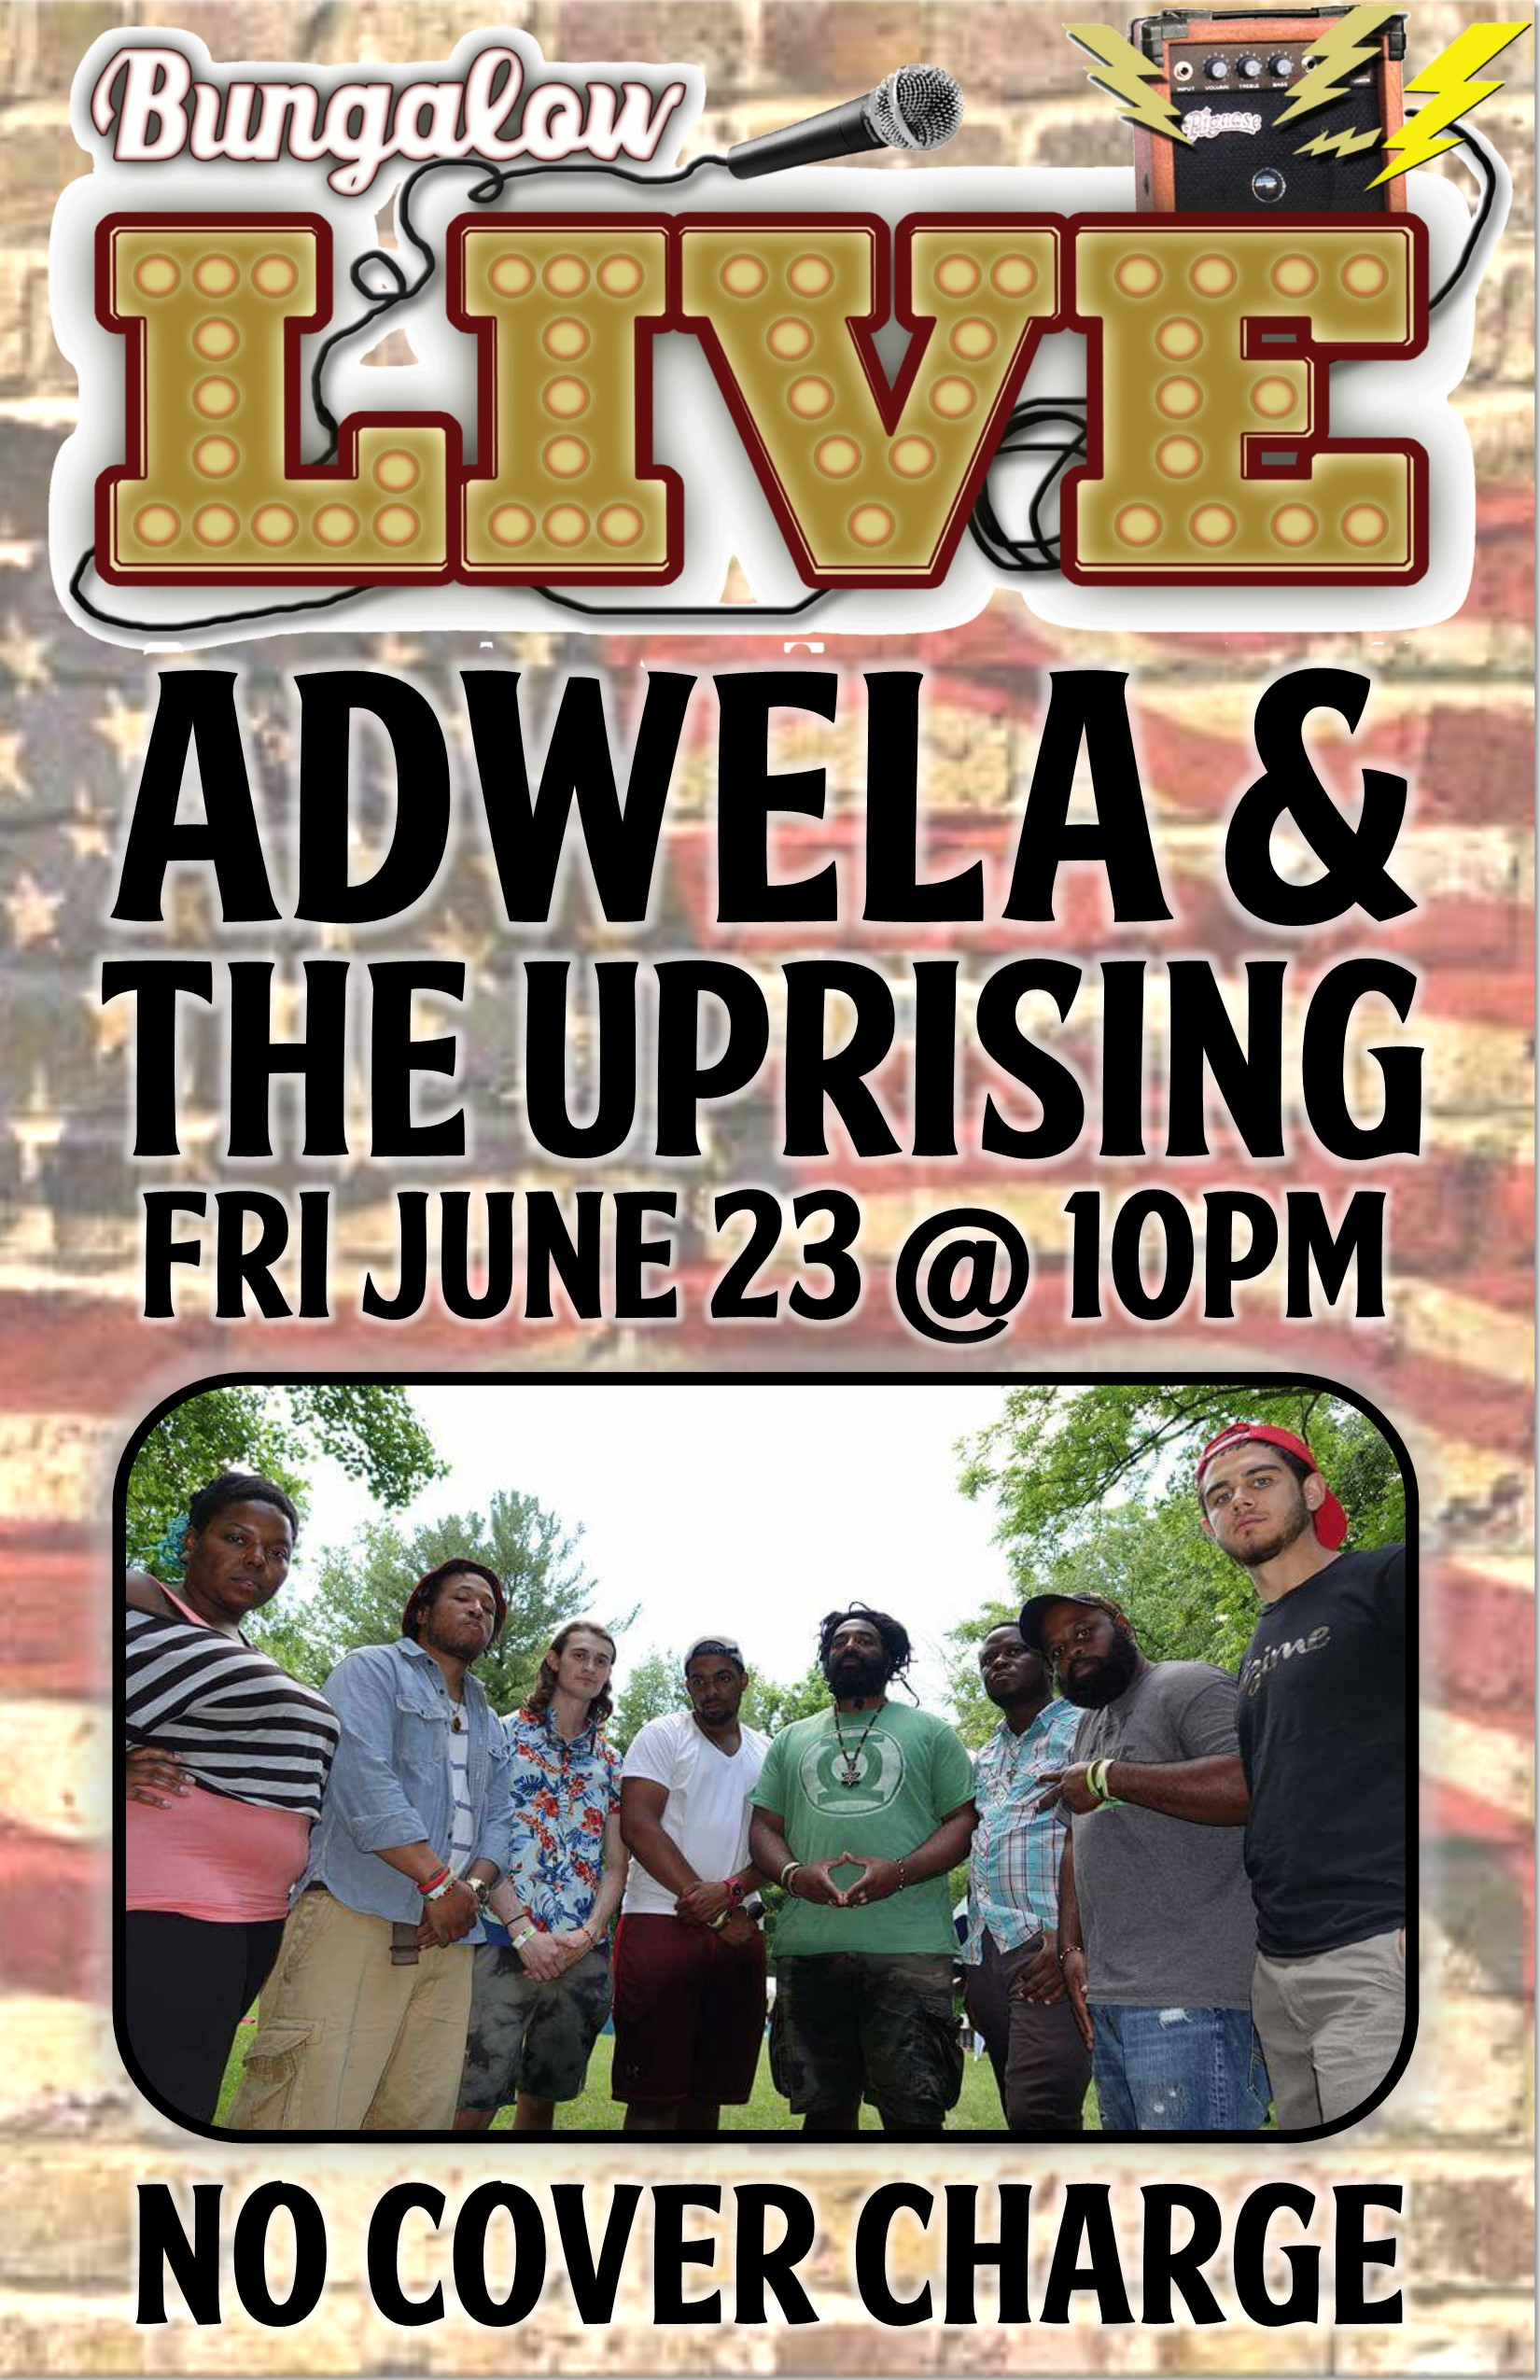 Adwela & The uprising 11x17